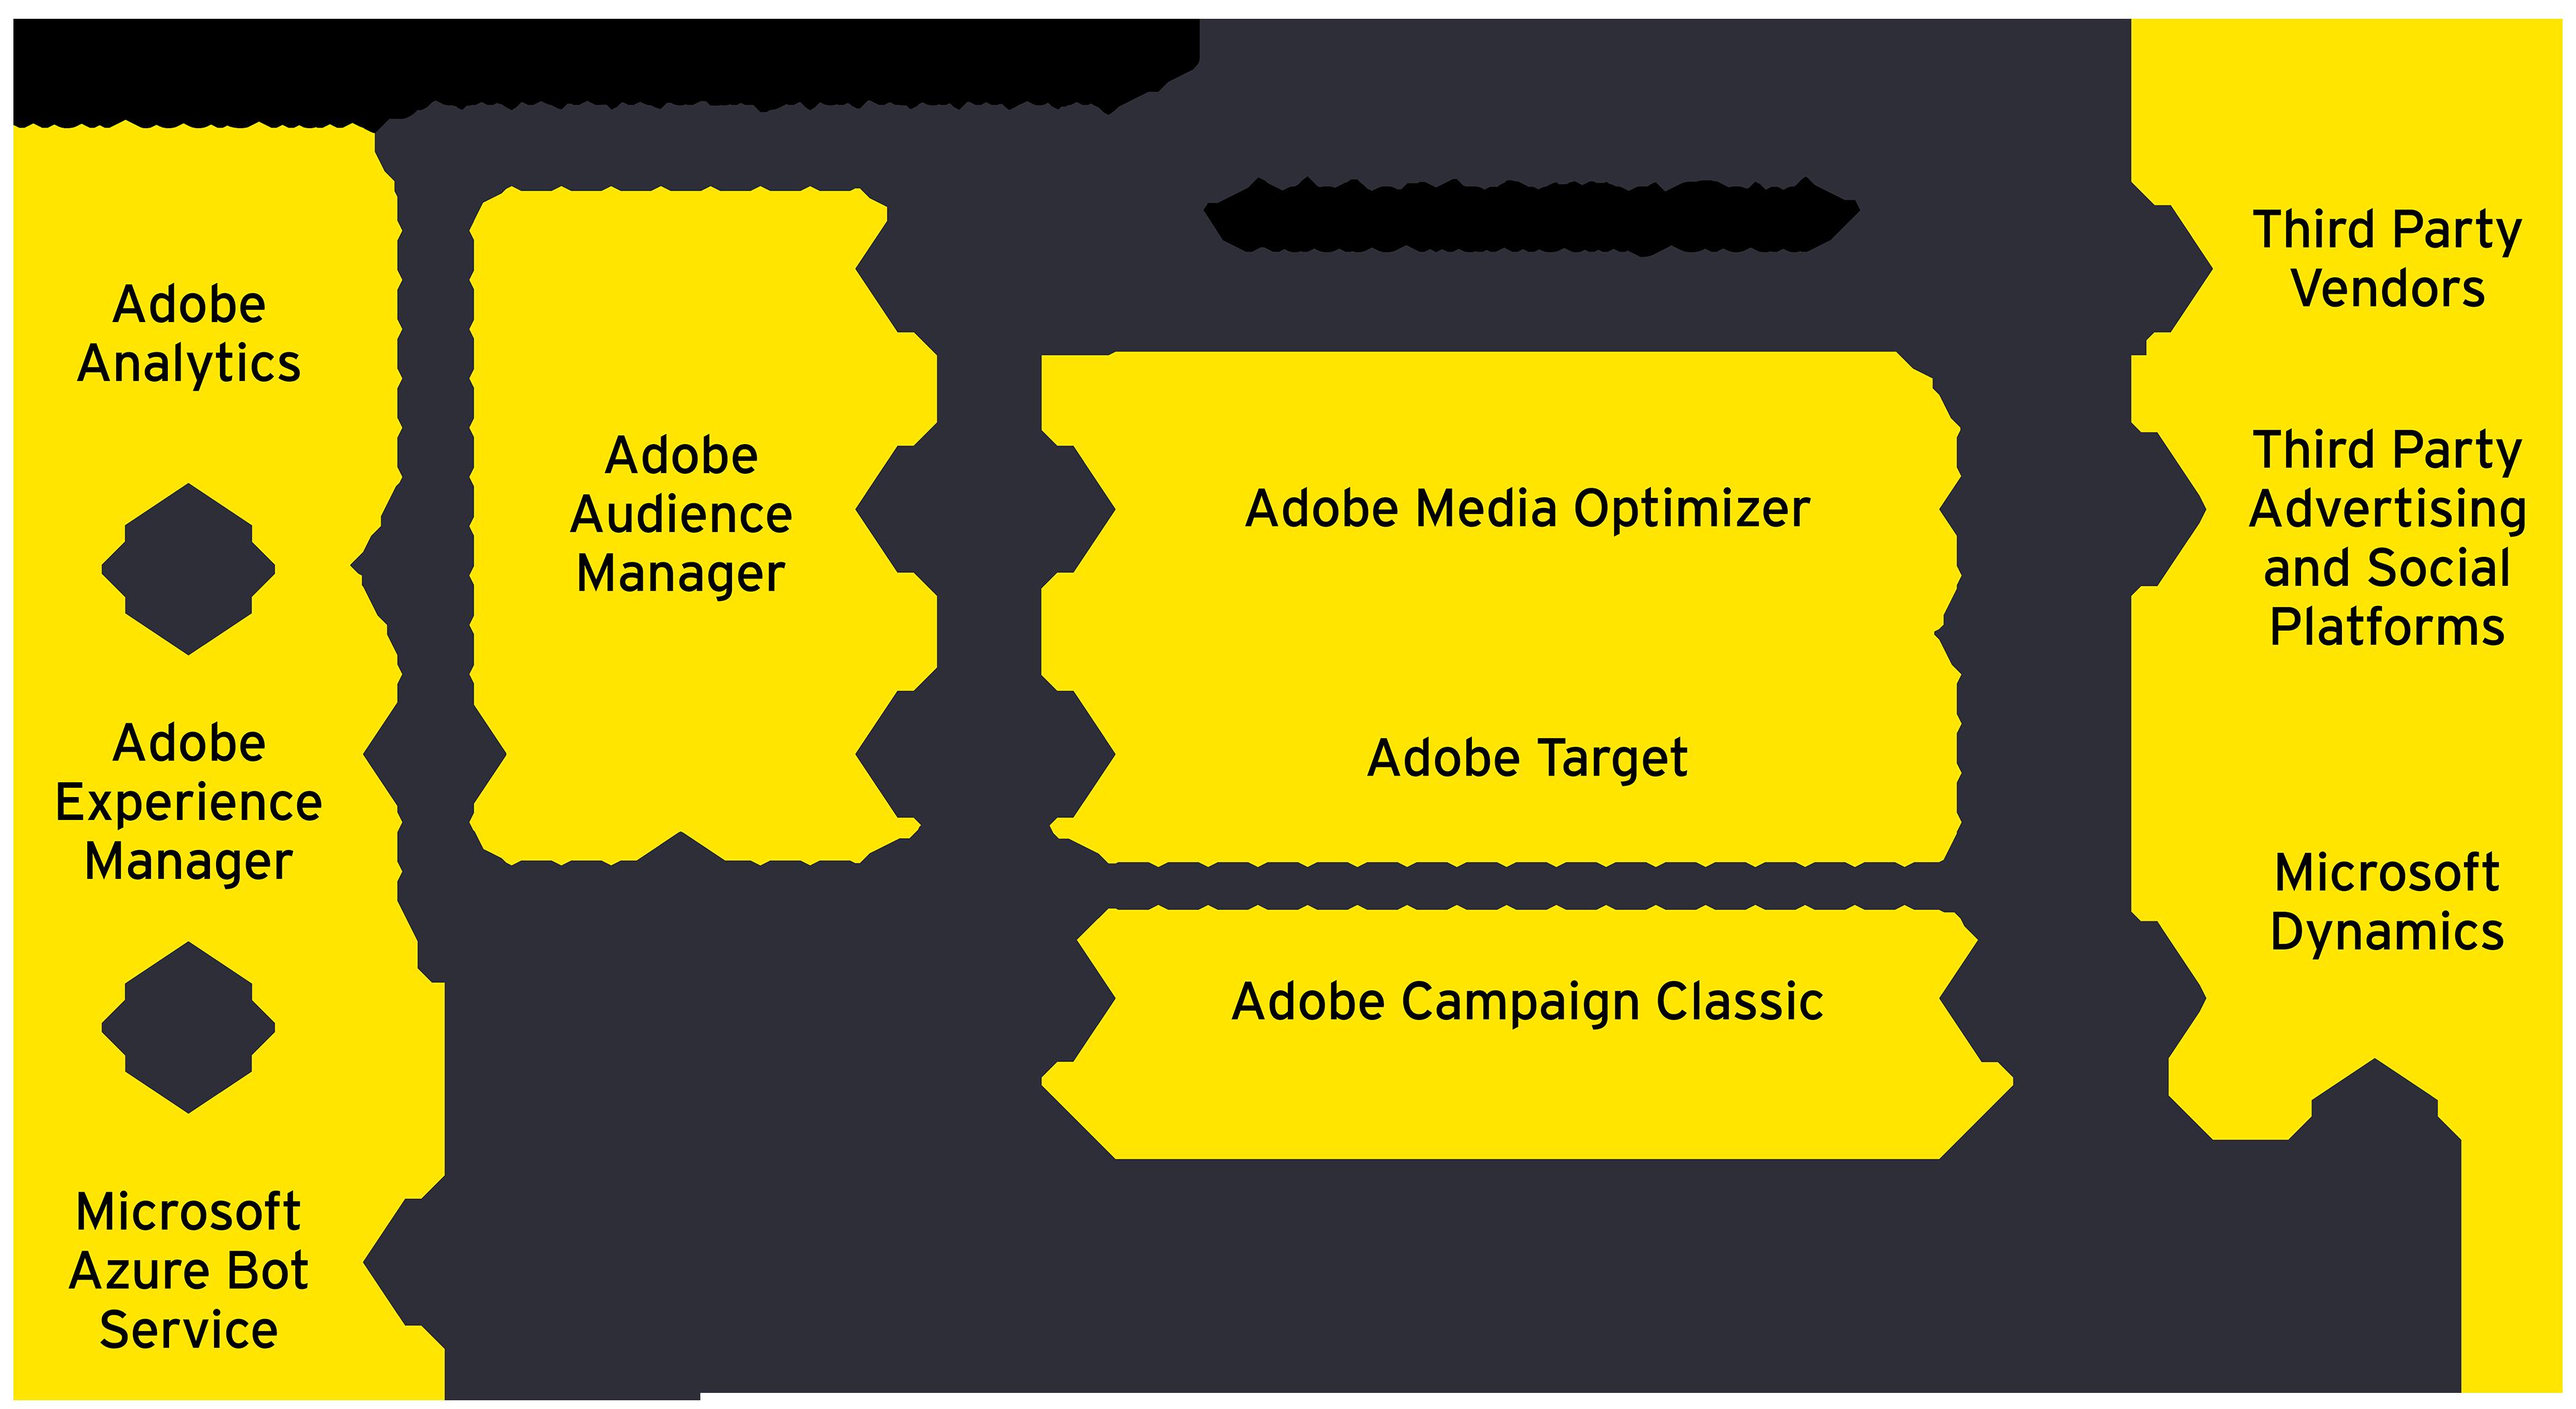 New tools transformed digital marketing